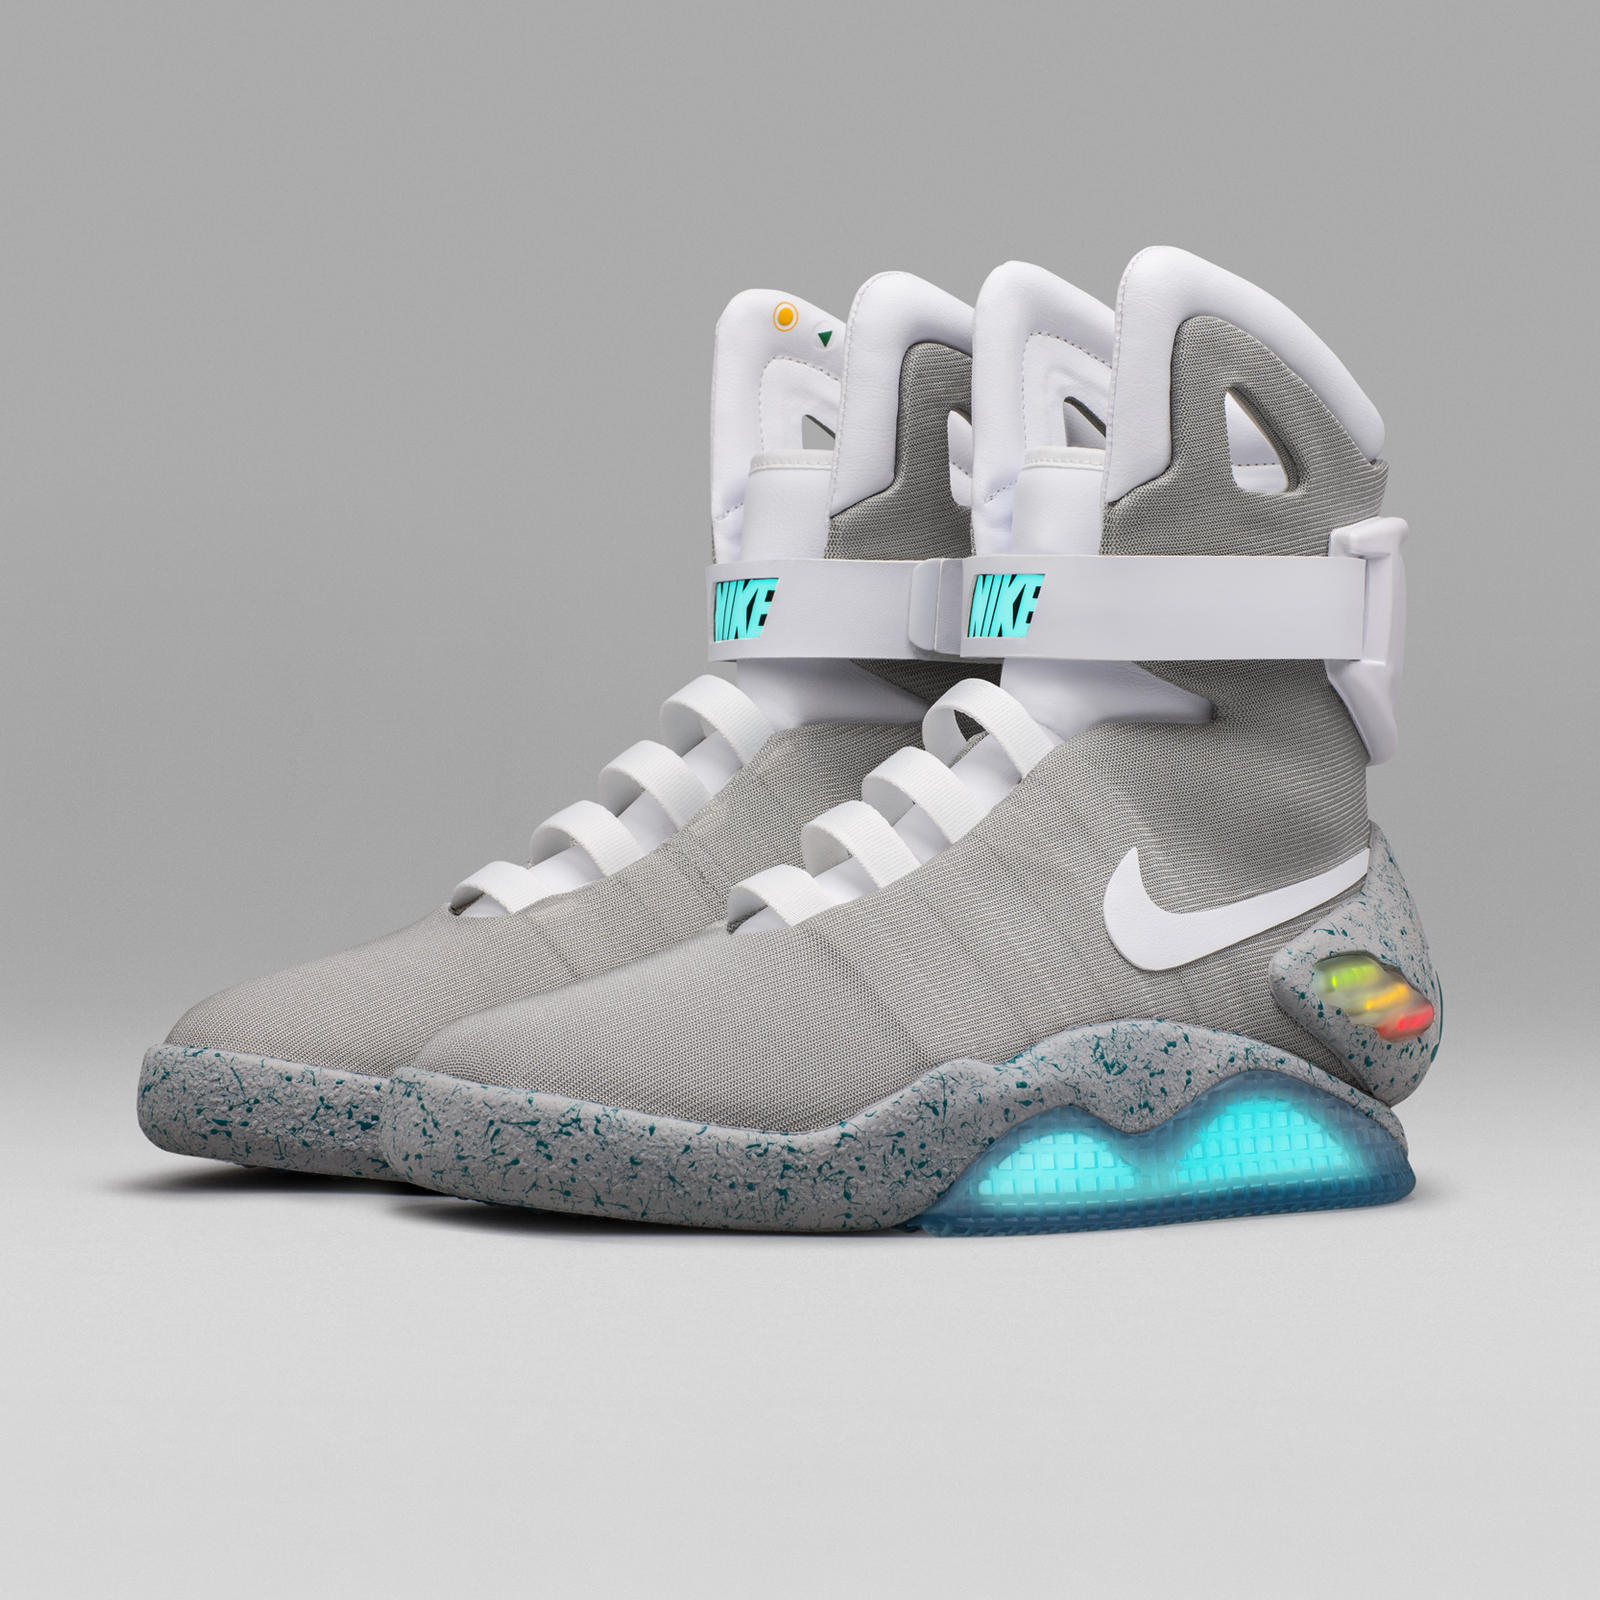 1. Nike Mag 2016 — $25,000